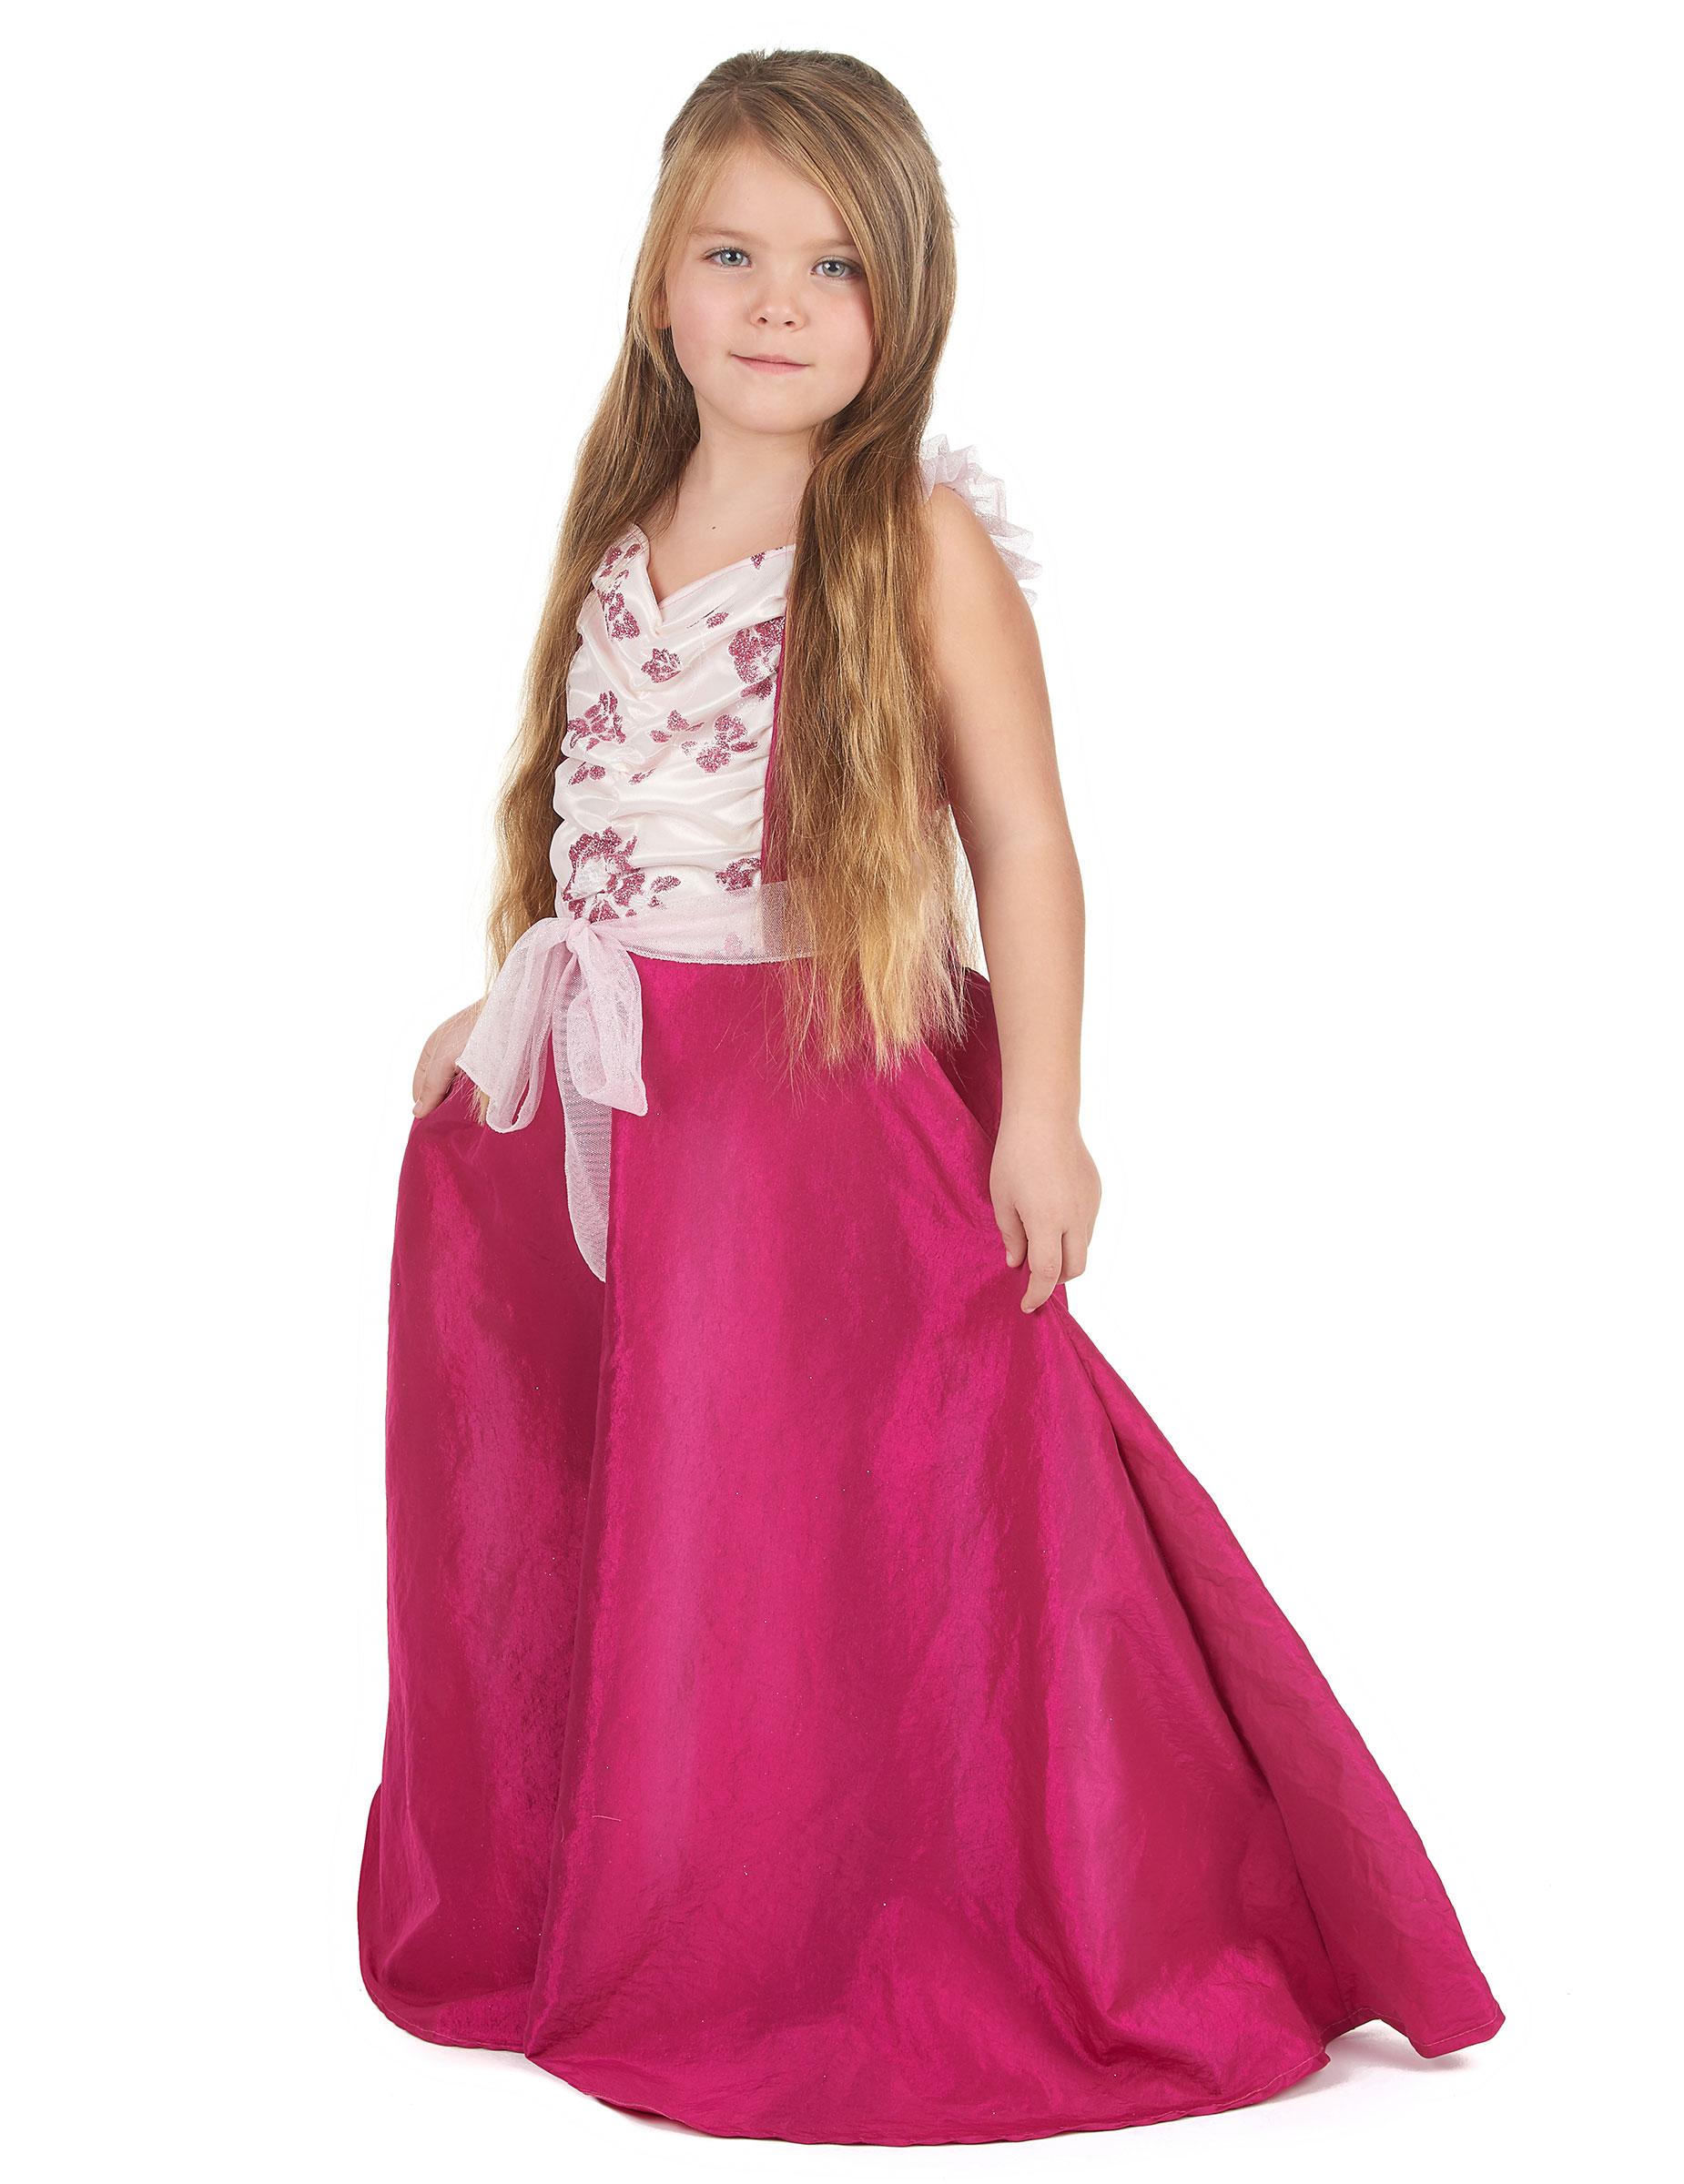 D guisement robe de bal luxe fille deguise toi achat de for Robes de bal de plage robe de bal